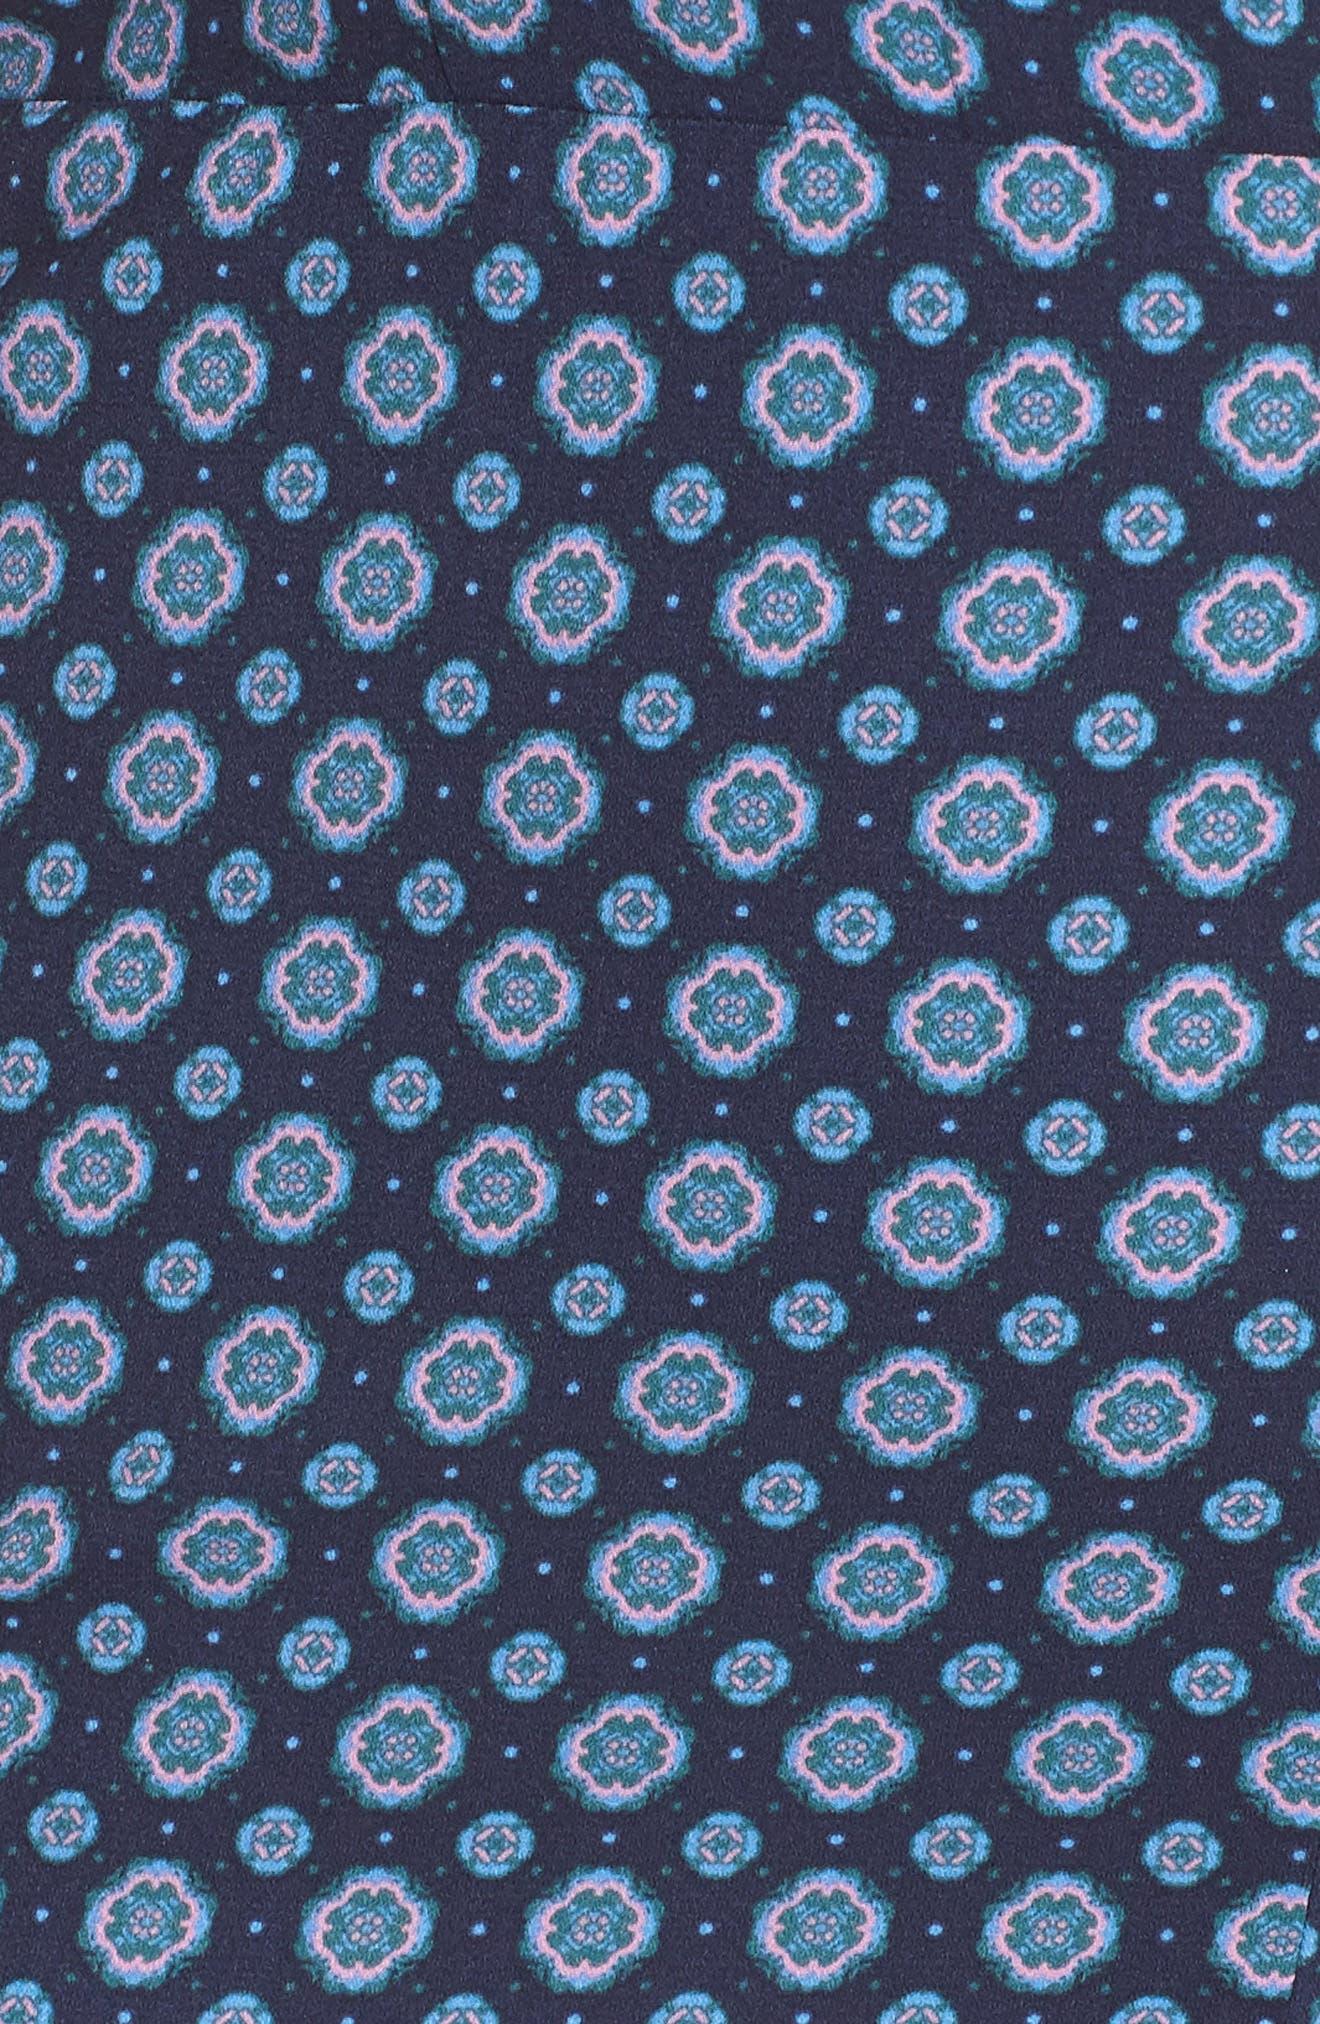 Print Button Front Jumpsuit,                             Alternate thumbnail 12, color,                             NAVY PEACOAT GEO DOT FOULARD